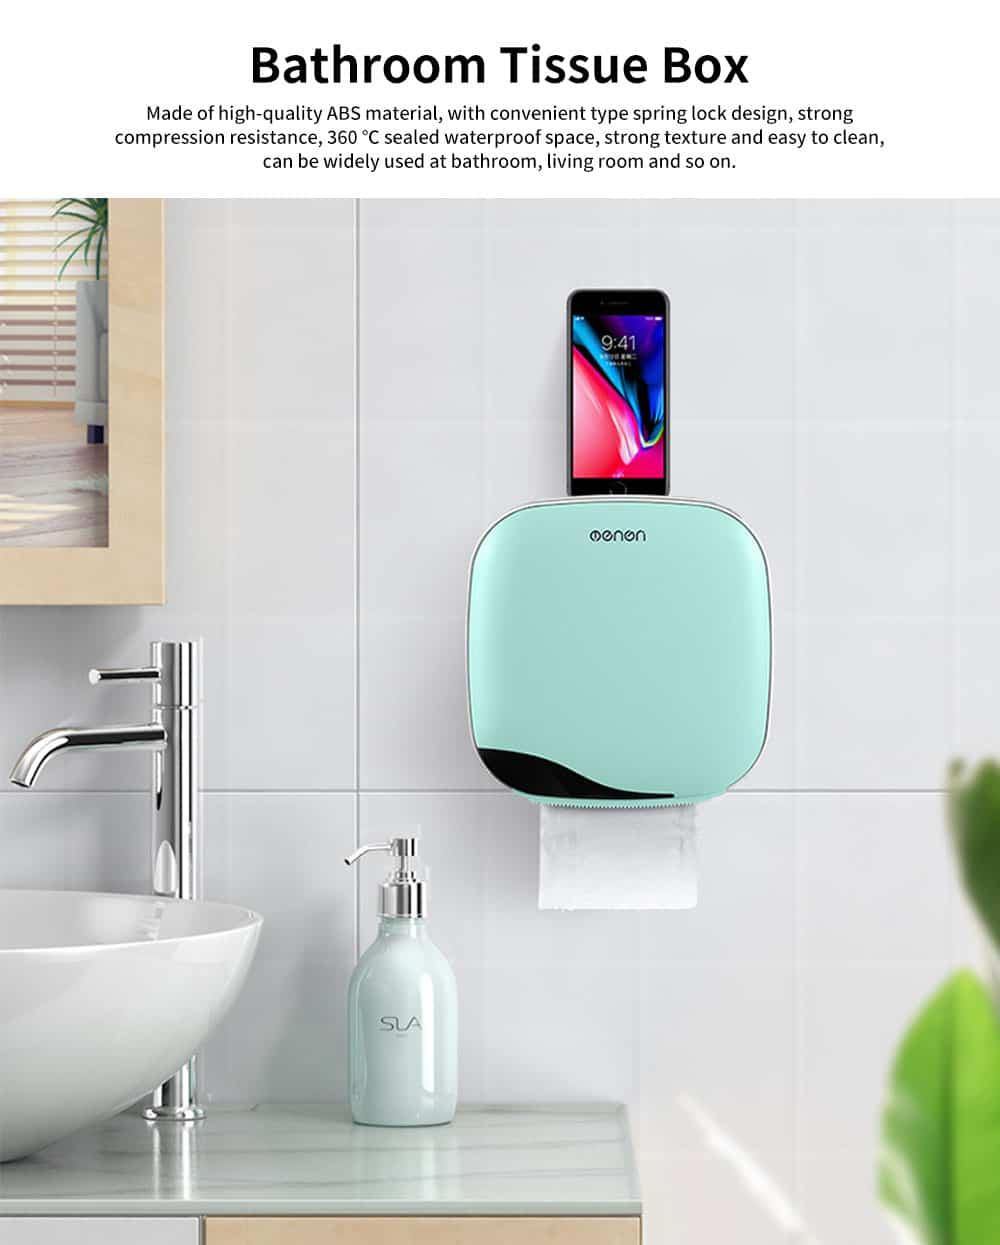 Bathroom Tissue Box, Punch-free Roll Paper Storage Box, with Convenient Type Spring Lock Design 0